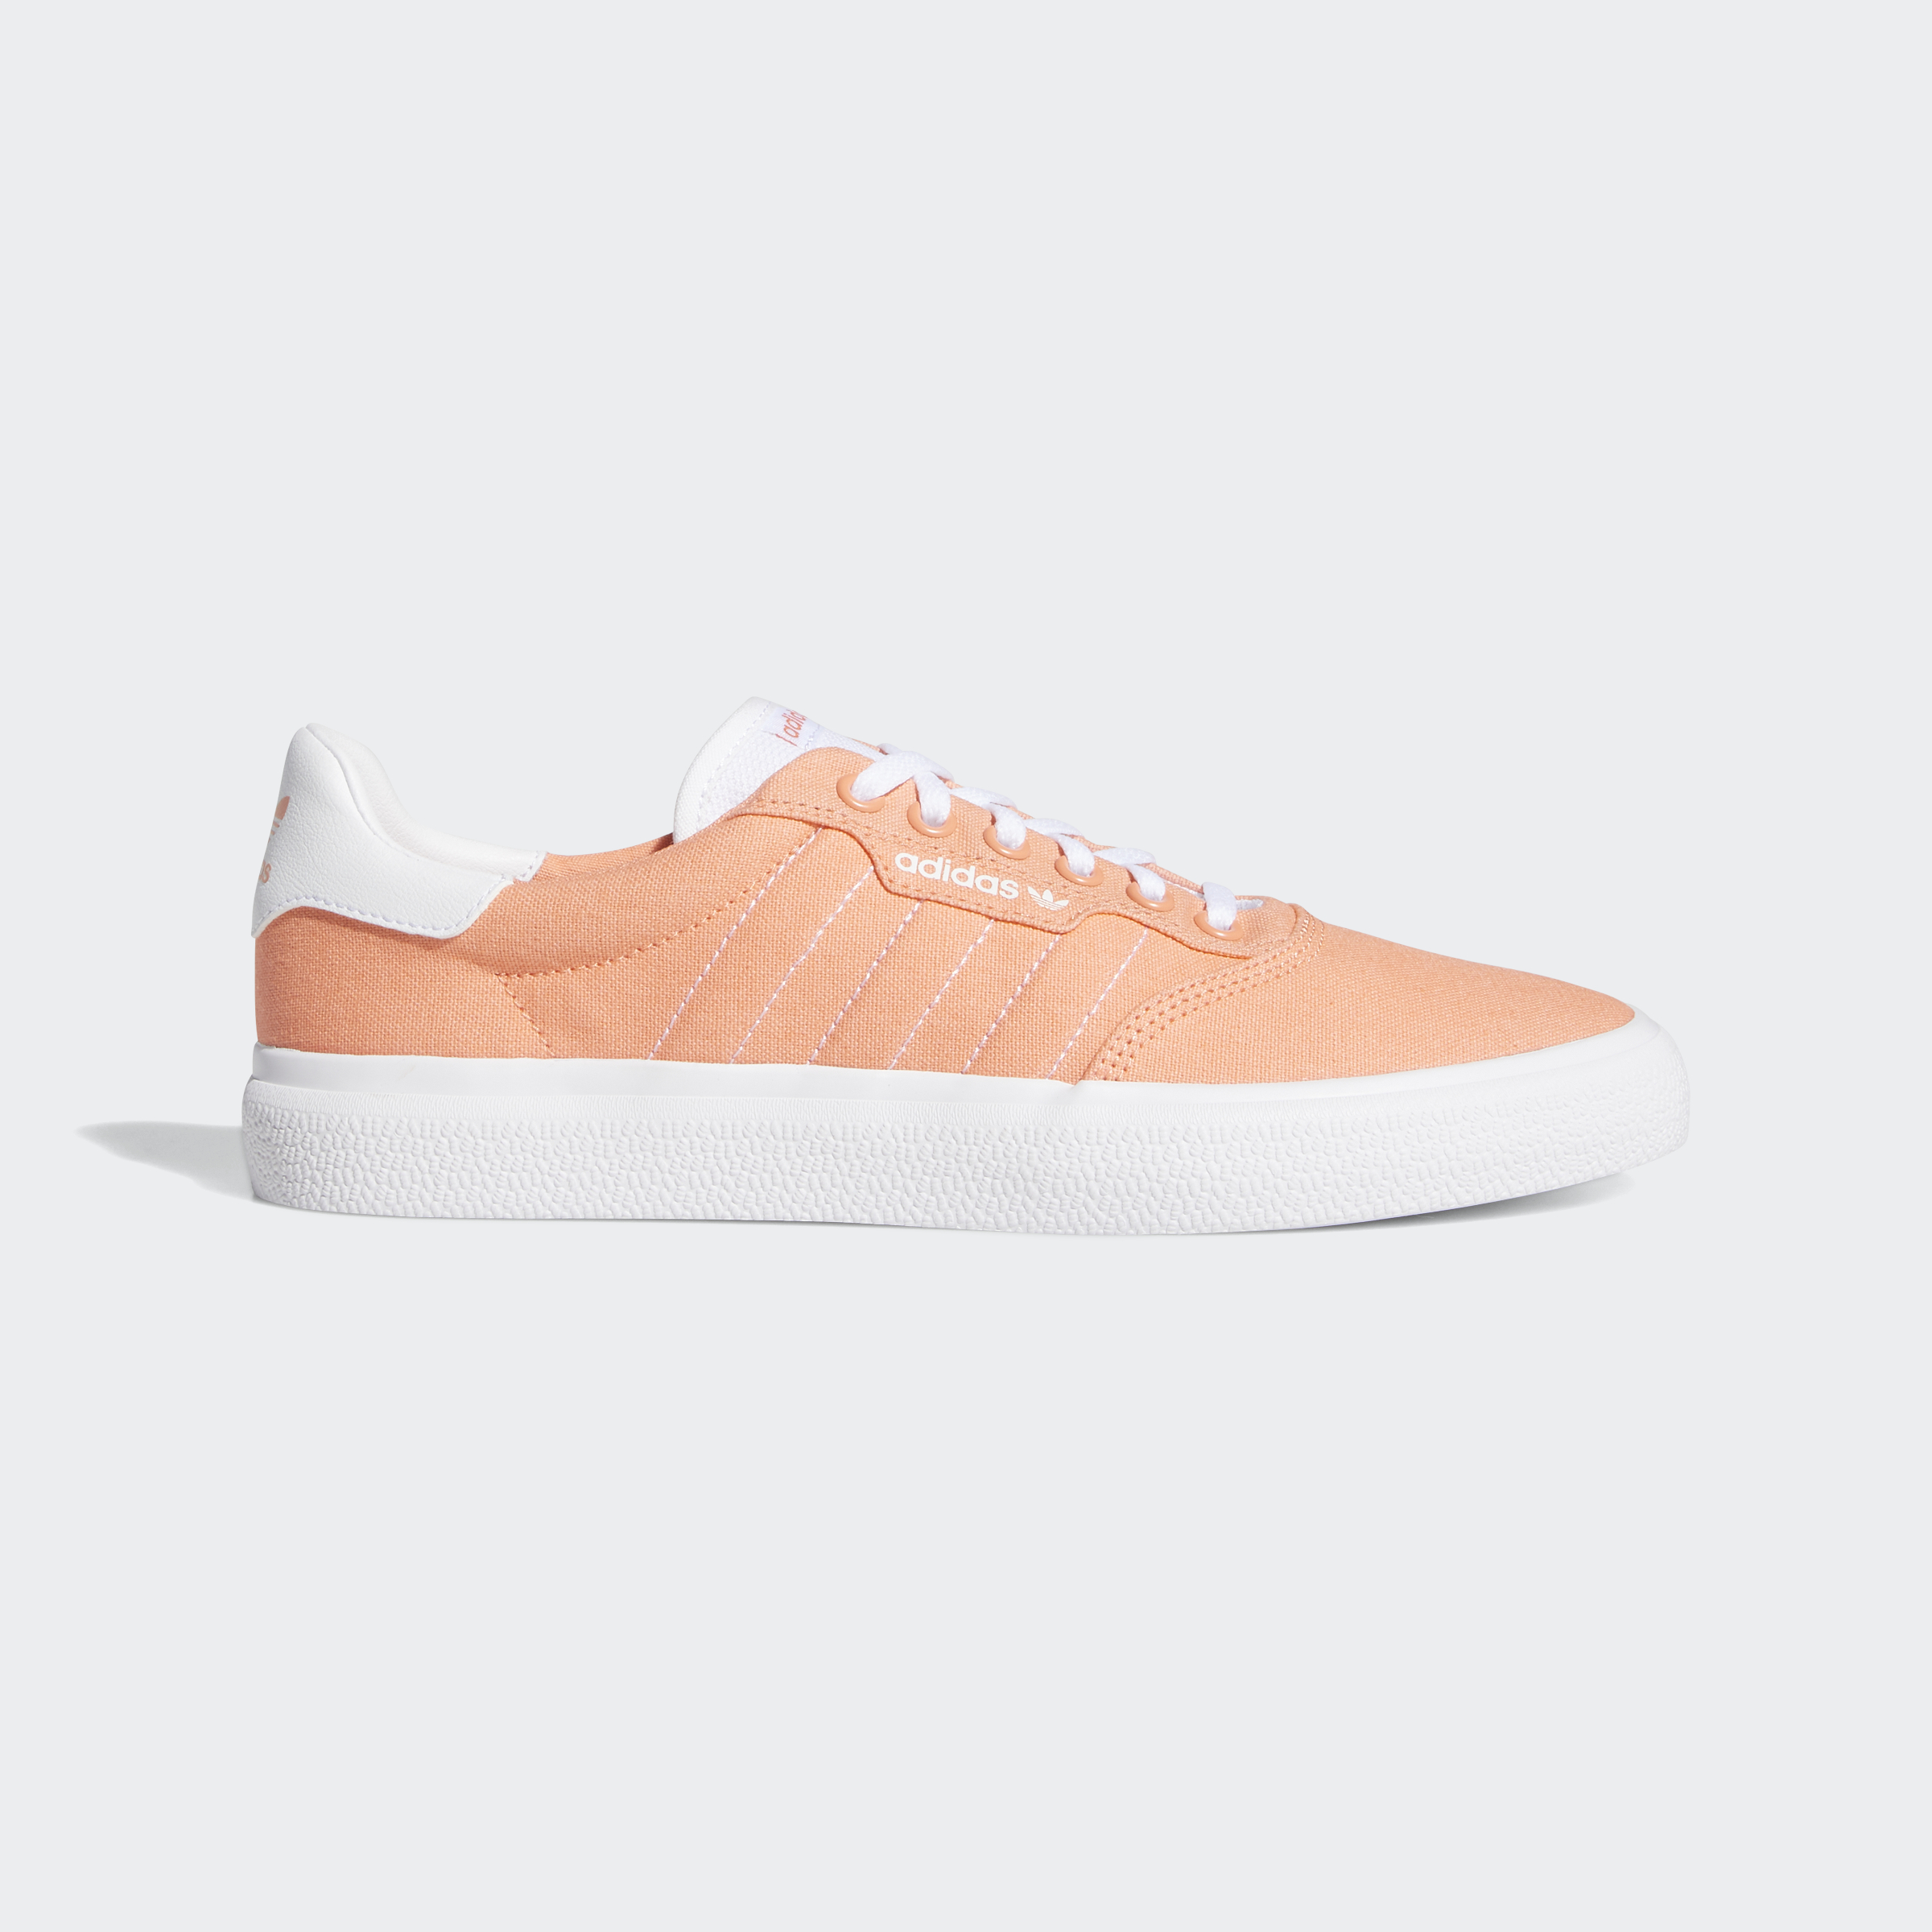 adidas-3MC-Shoes-Athletic-amp-Sneakers thumbnail 22